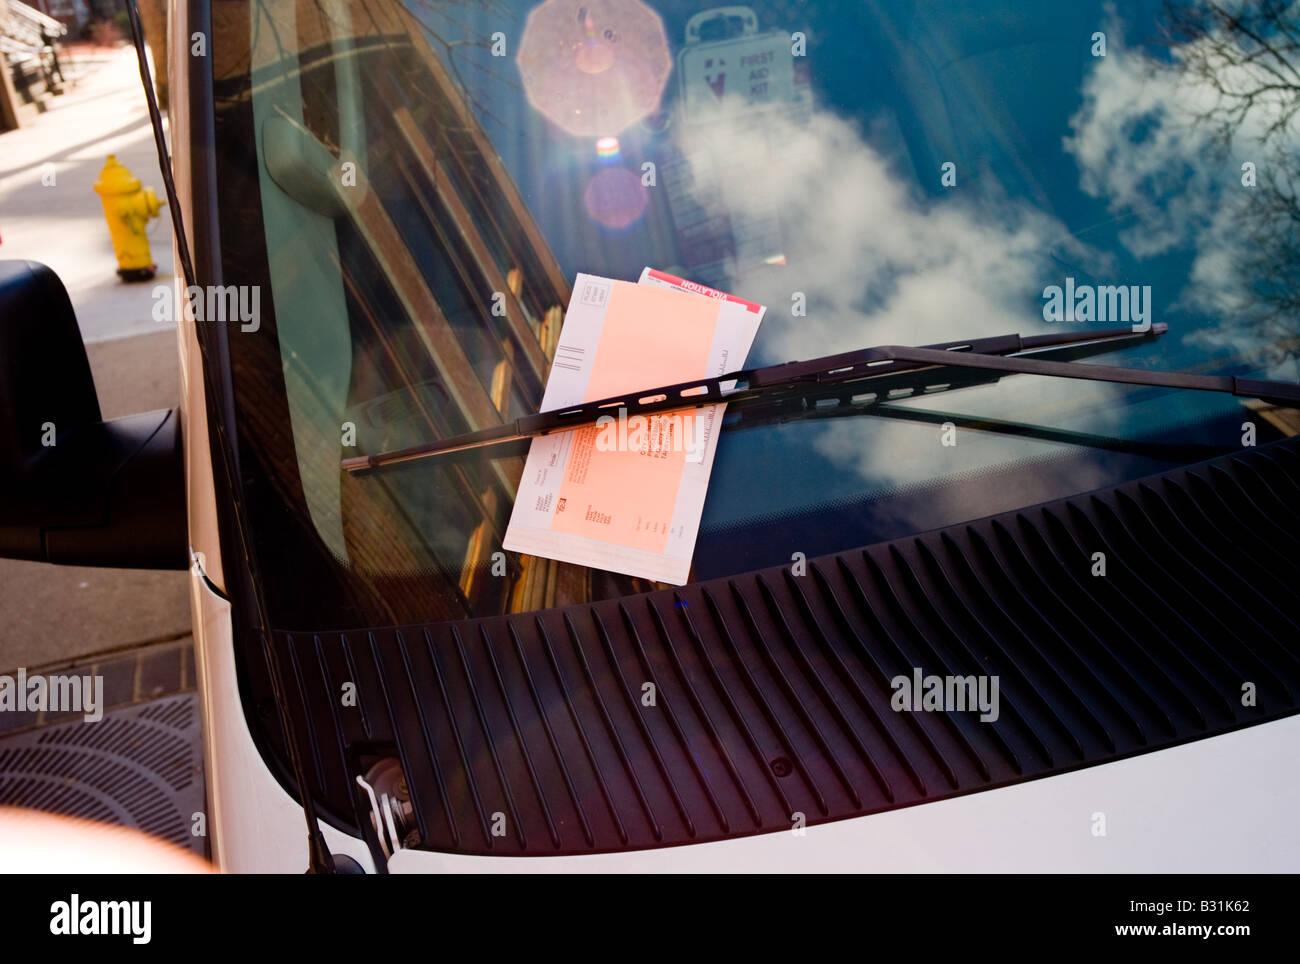 A parking ticket on a Mini-van windscreen - Stock Image